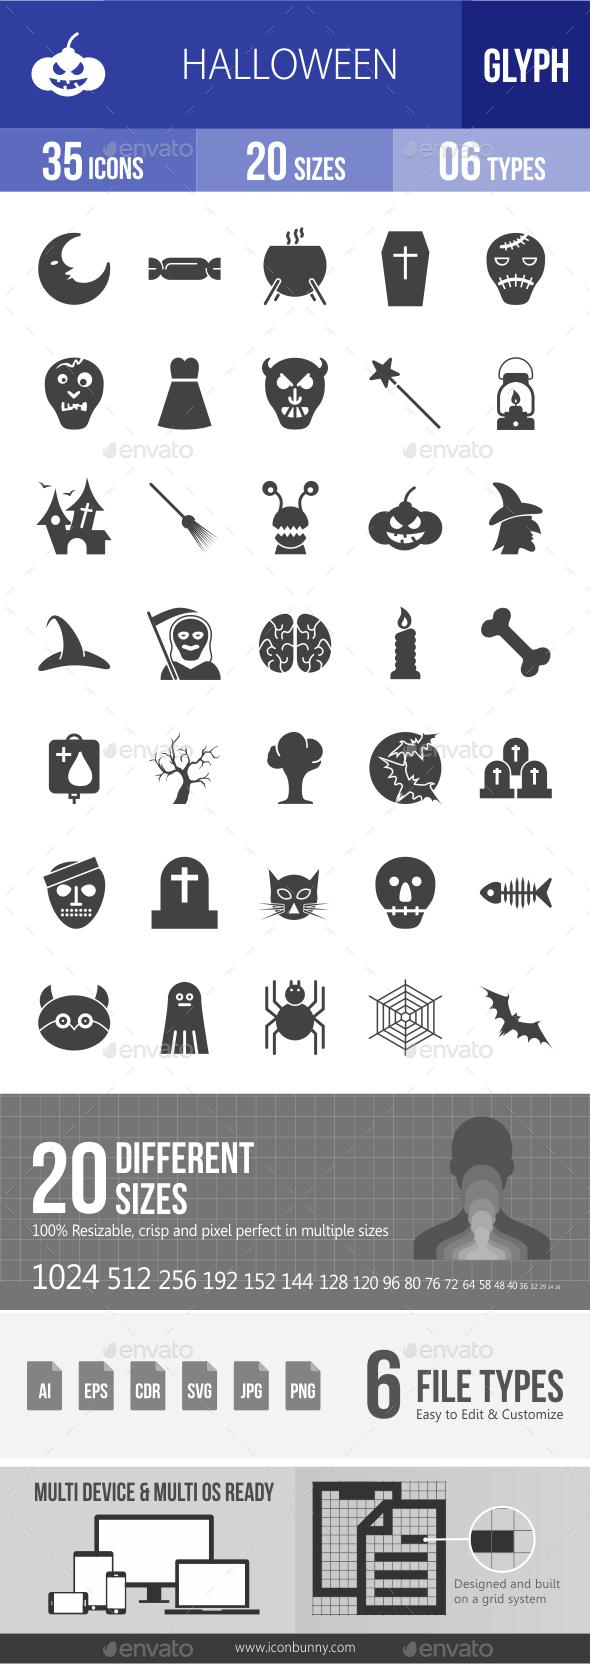 Halloween Glyph Icons